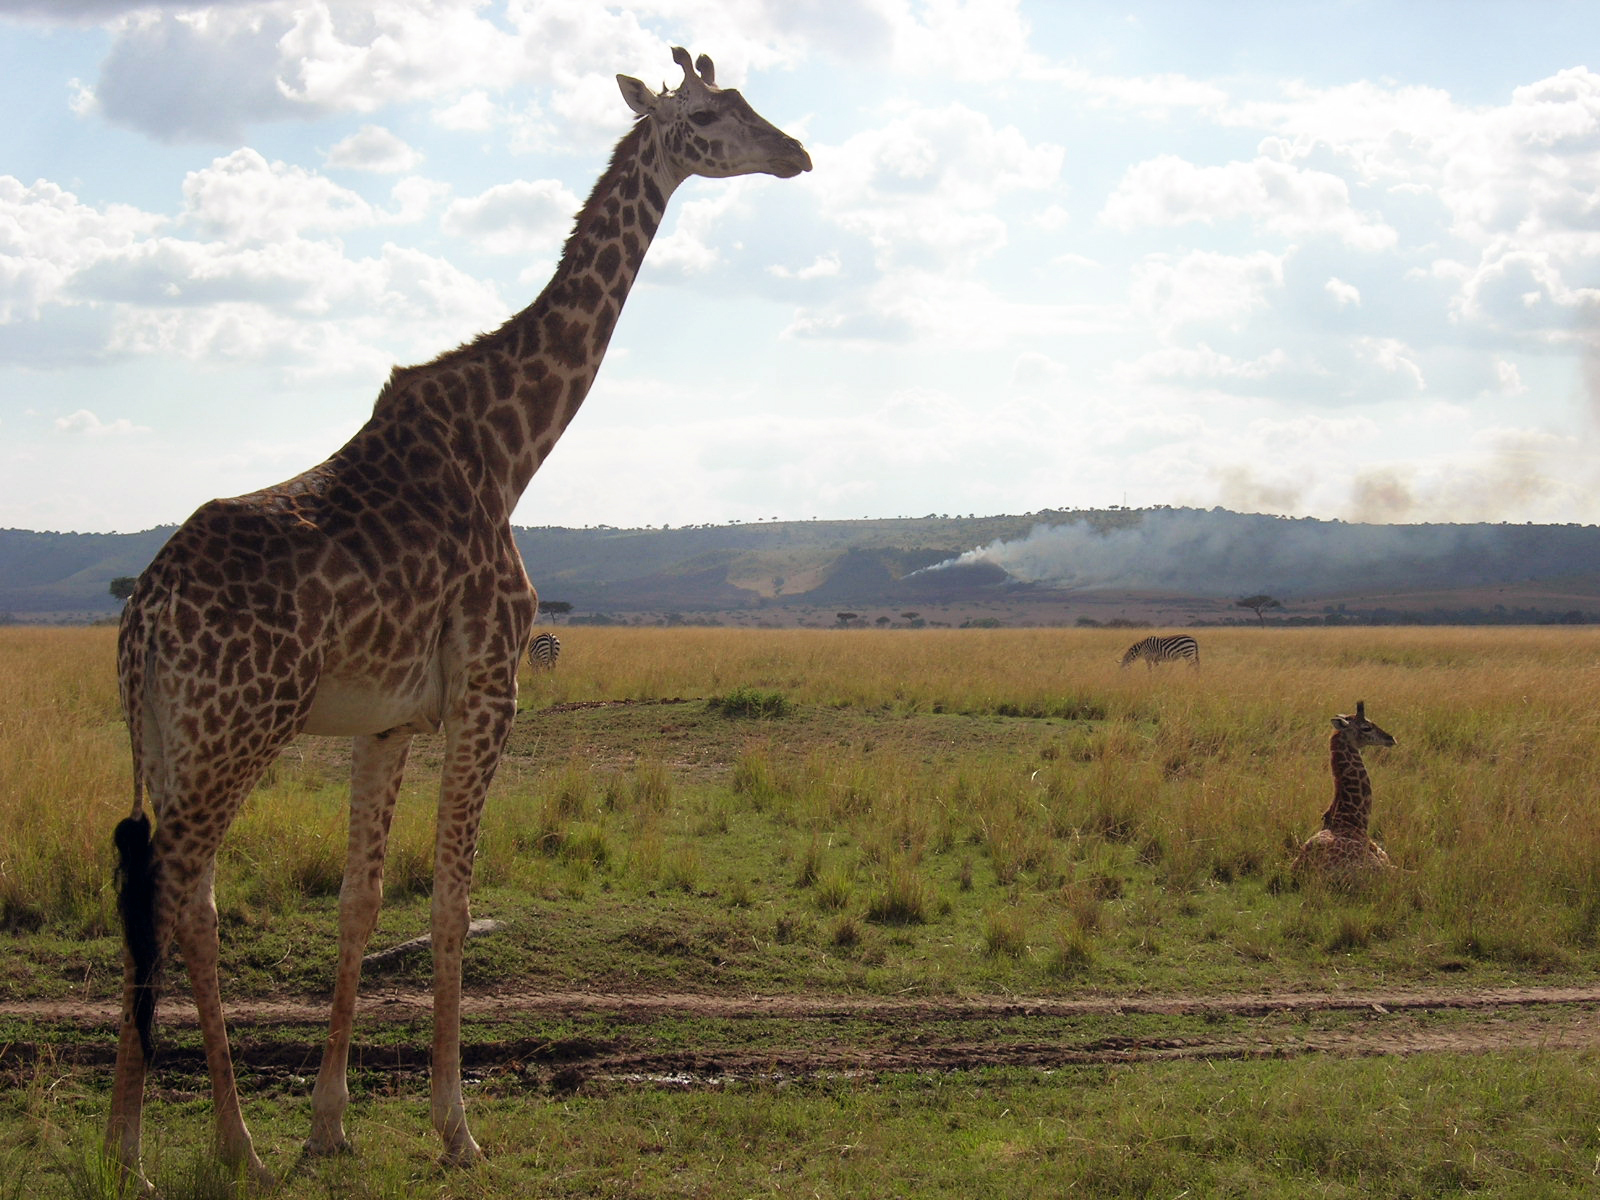 Giraffe with calf. Maasai Mara Game Reserve, Kenya, 2008.